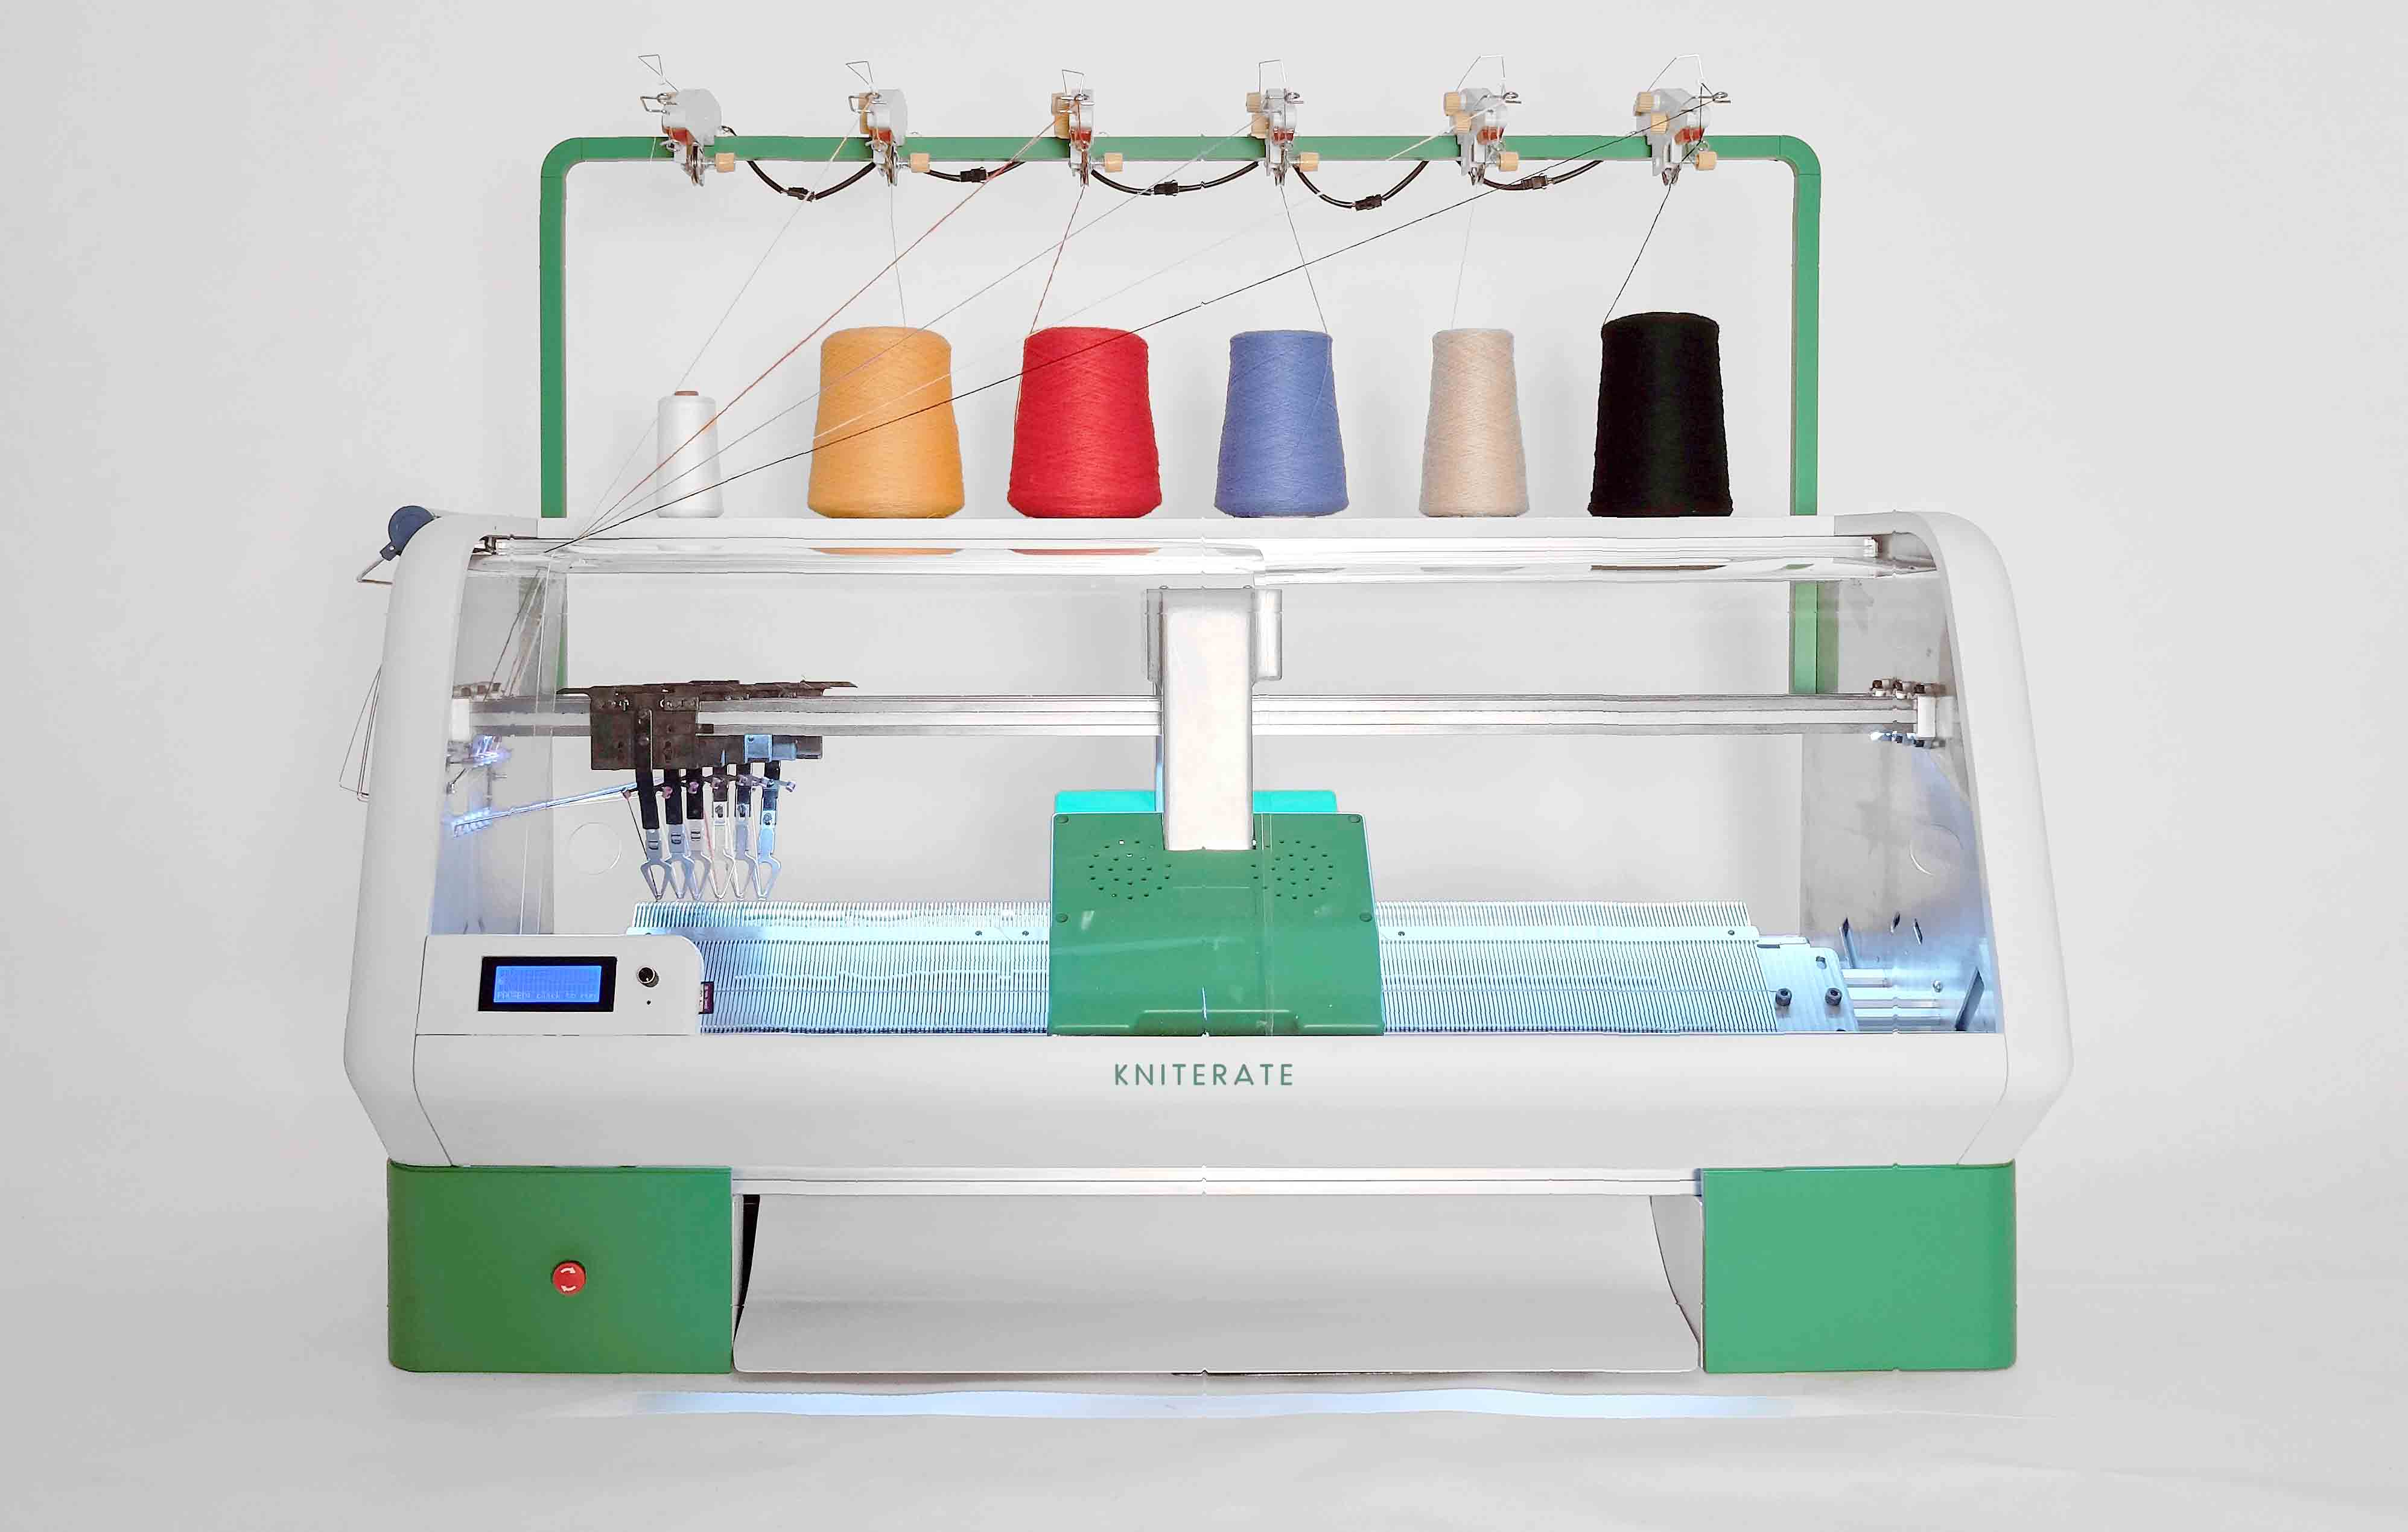 Kniterate | The Digital Knitting Machine Kniterate: the Digital ...